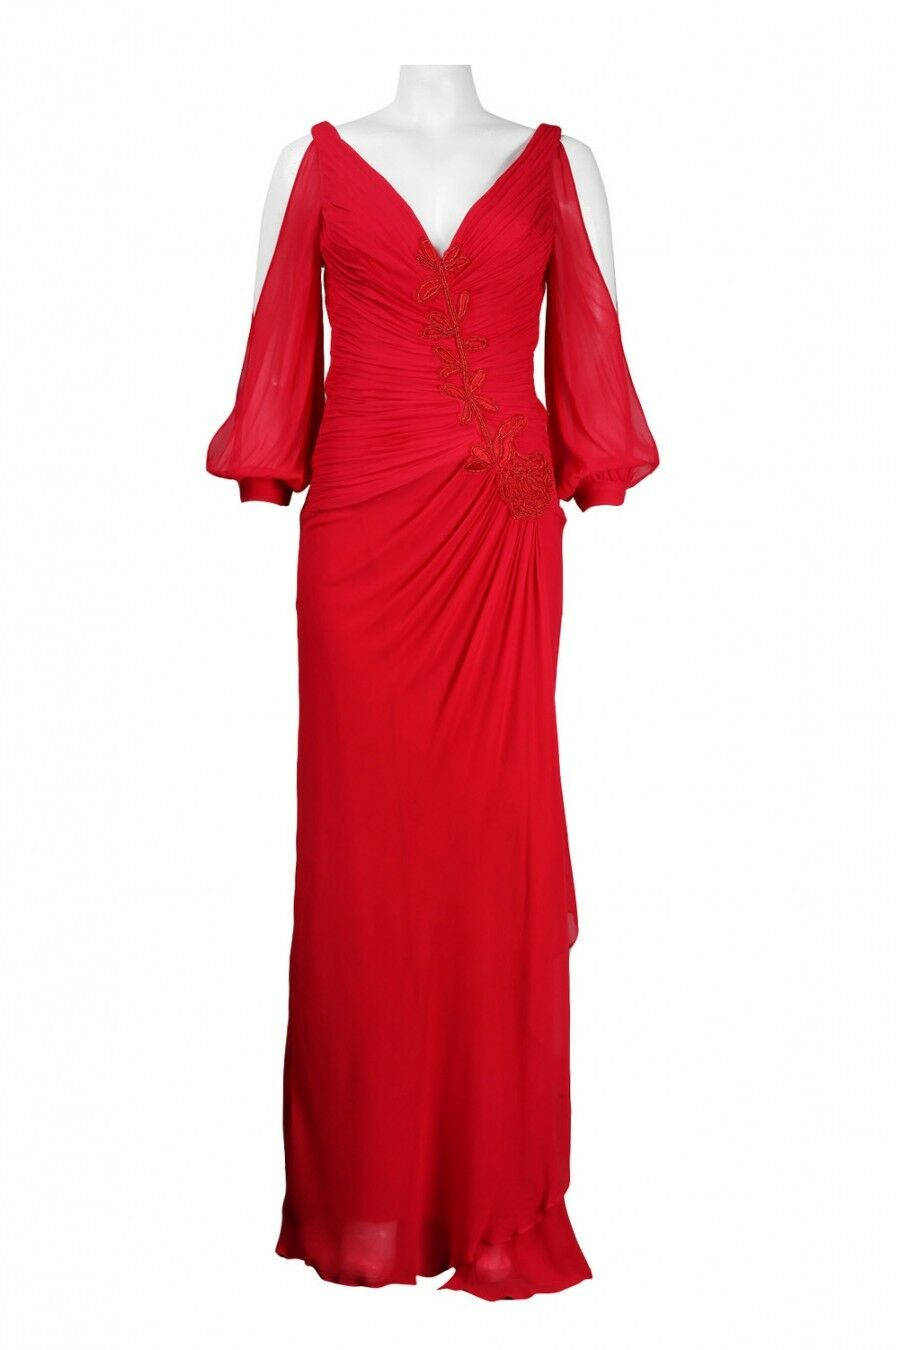 Nina Nina Nina Austin Size XS Women's Puff Slit Sleeve Red Dress Gown NWT NEW 62def8